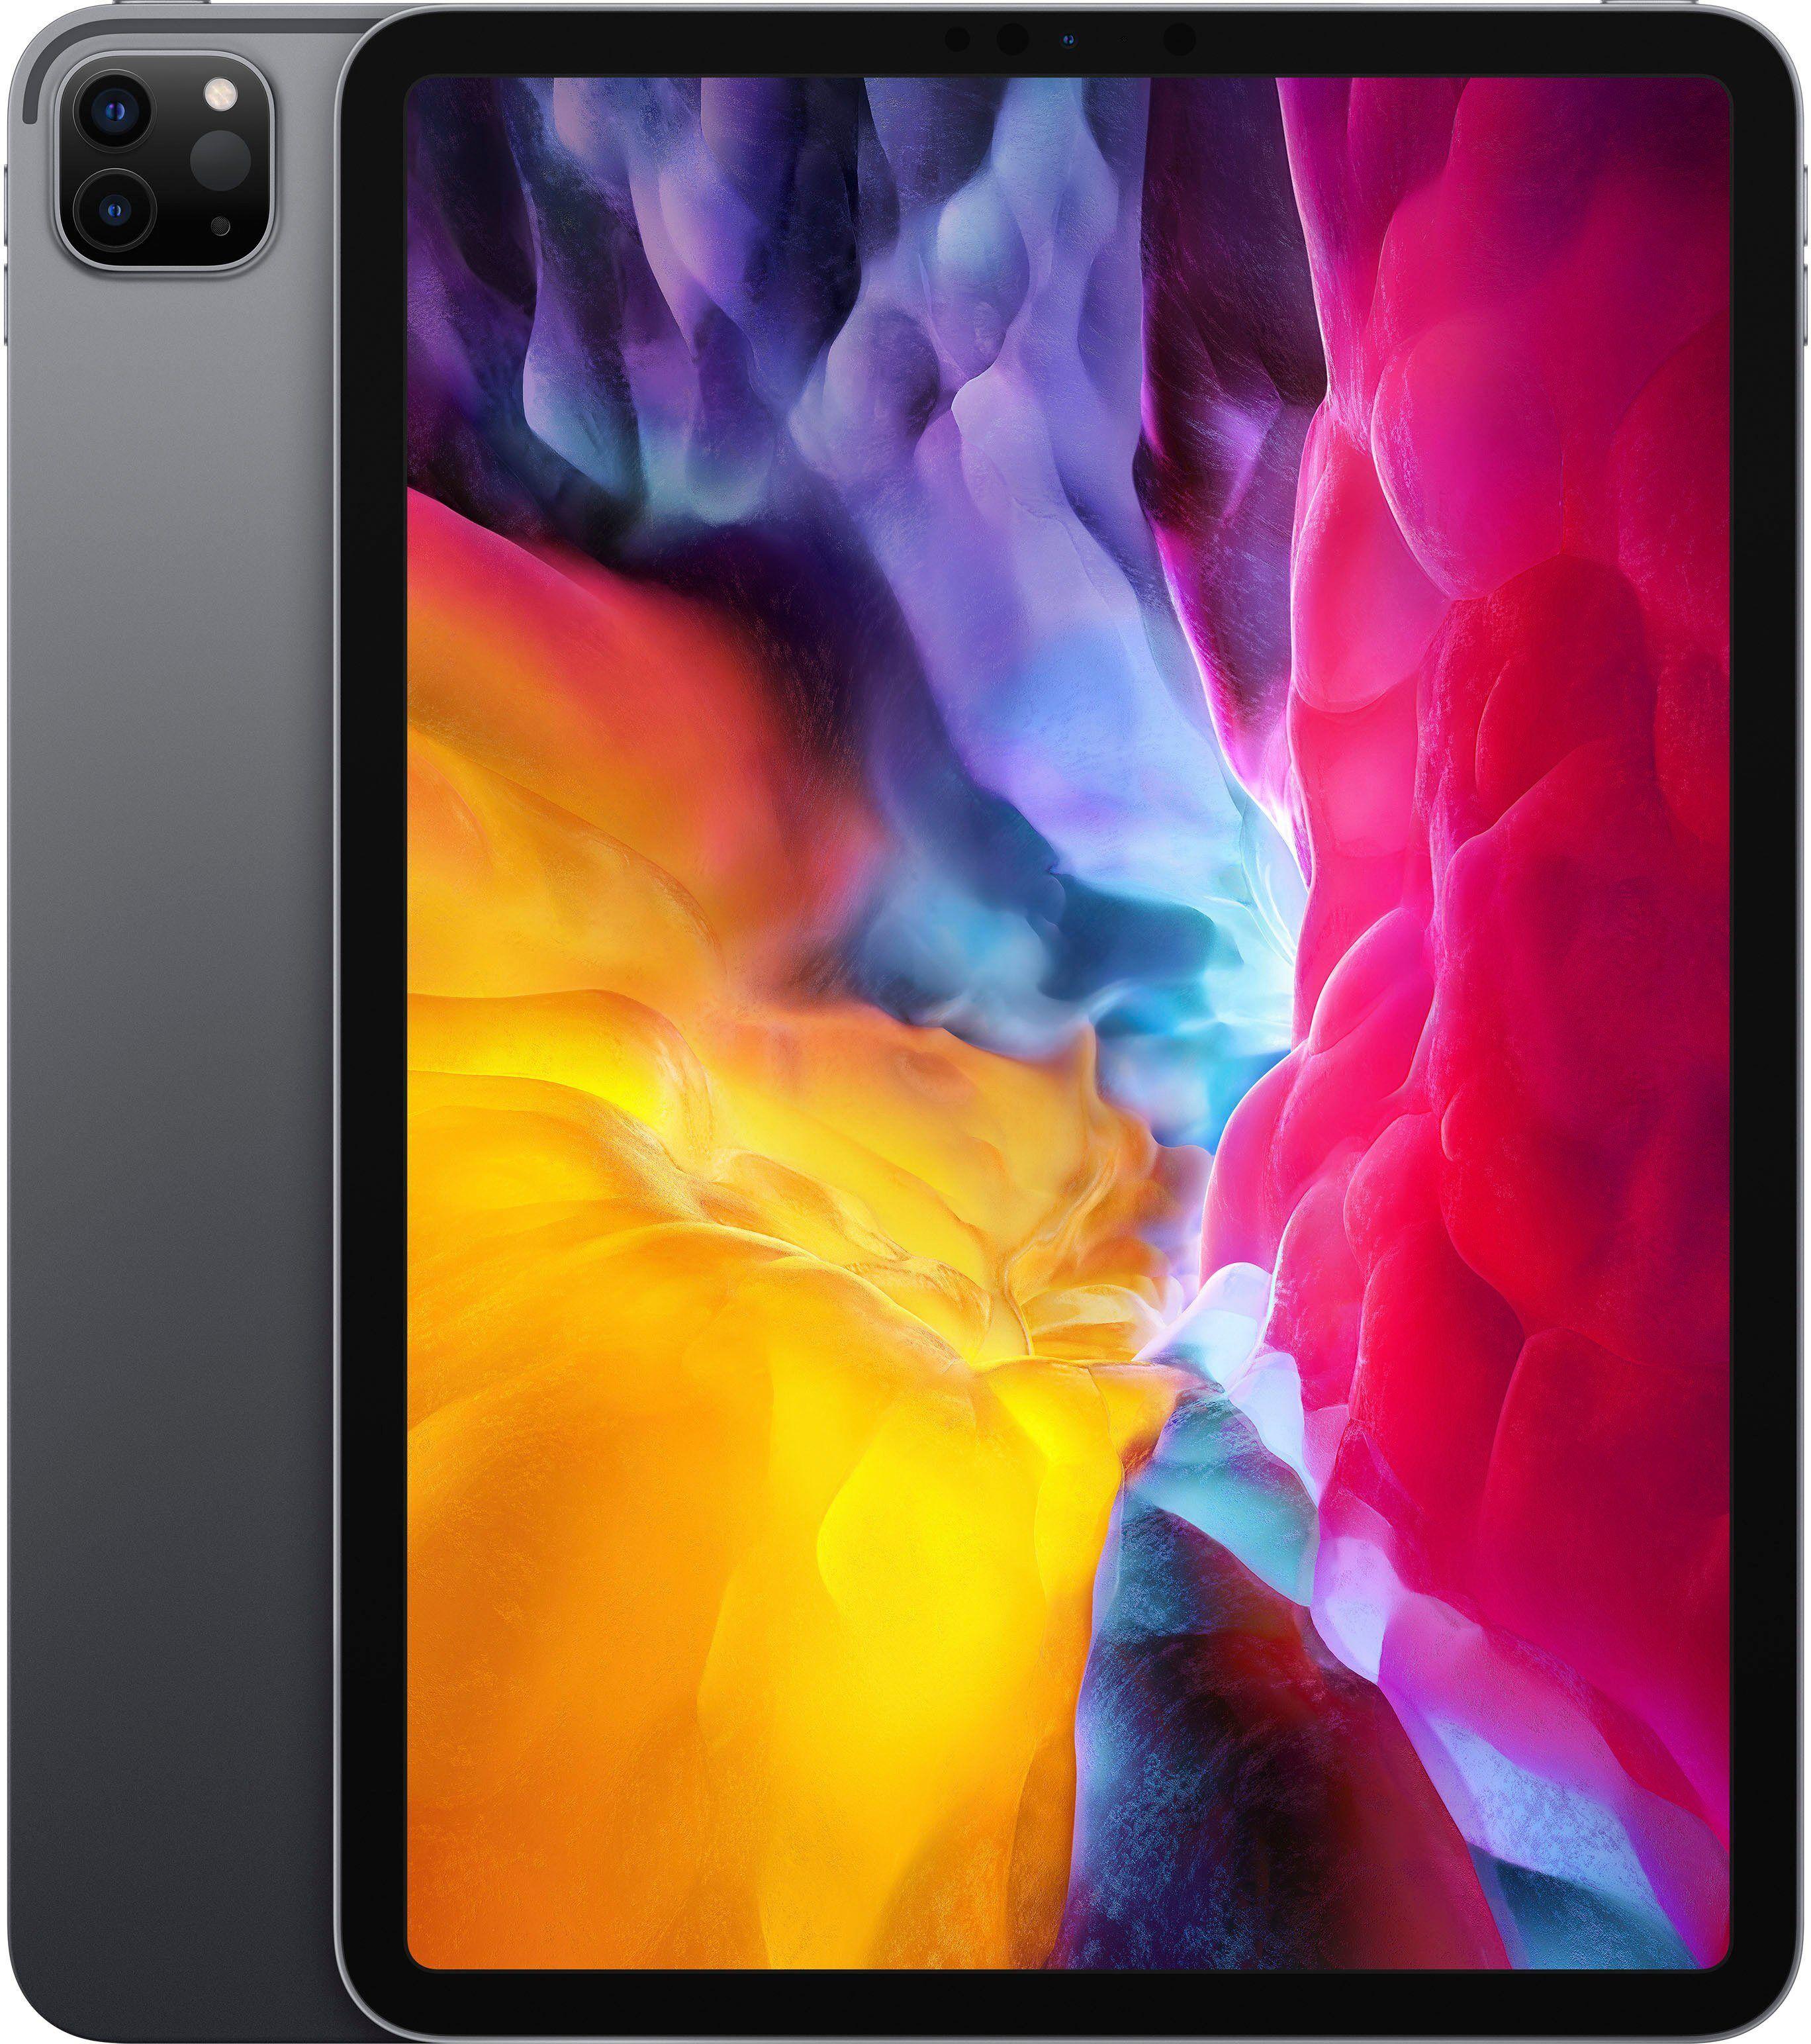 "Apple iPad Pro 11.0 (2020) - 512 GB WiFi Tablet (11"", 512 GB, iPadOS), Space Grau"